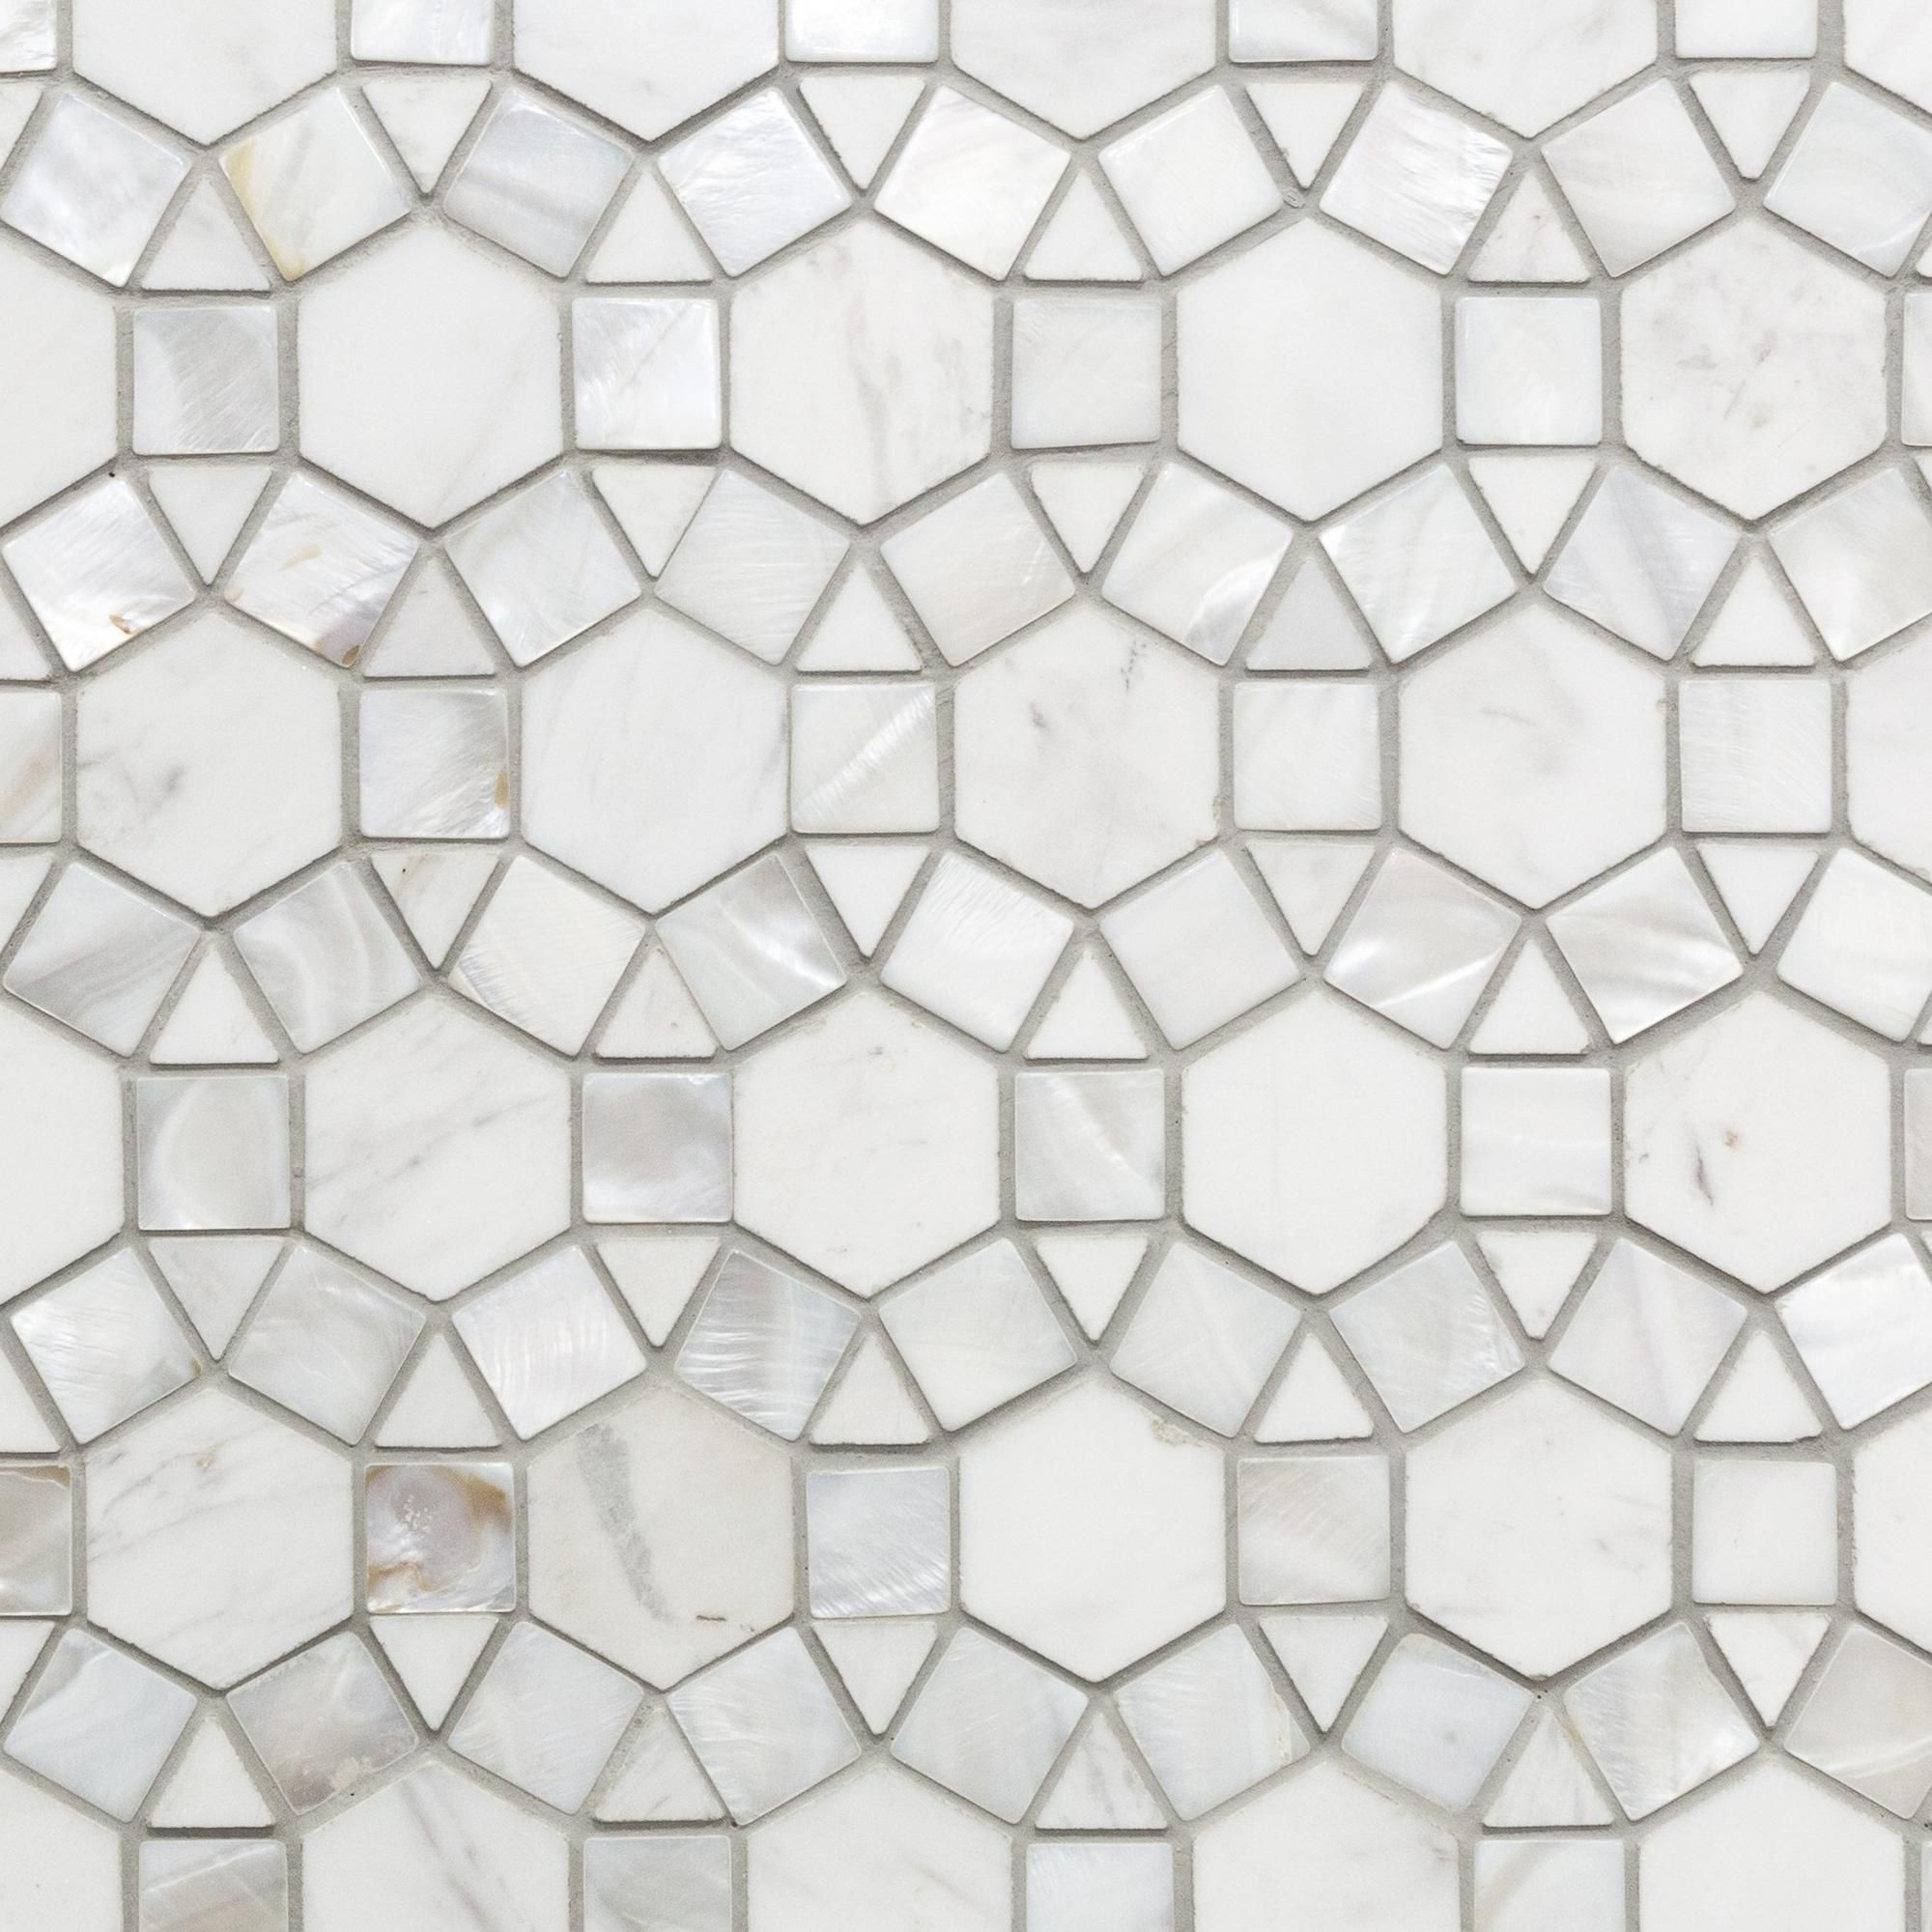 Carrara Circulos Water Jet Cut Mother Of Pearl Marble Mosaic